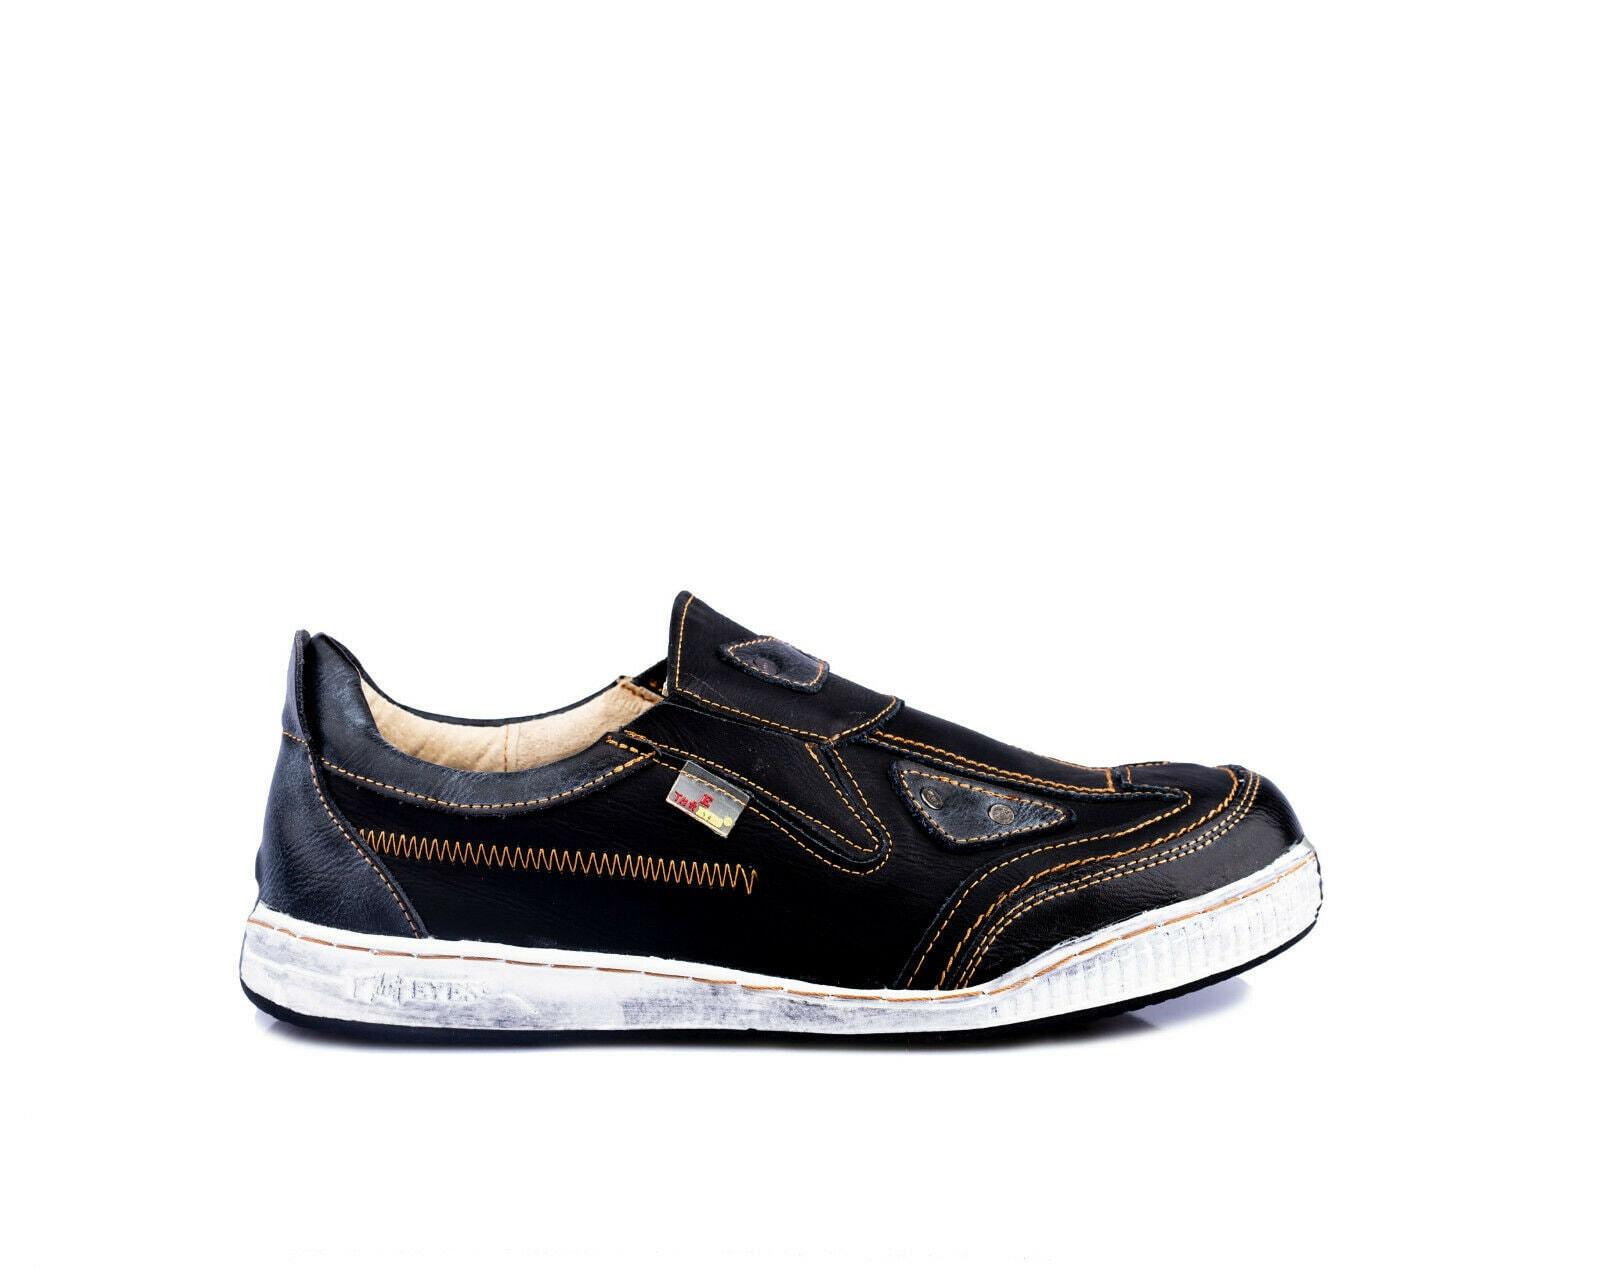 TMA 1905 Komfortable Damen Halbschuhe Sneaker Leder schwarz alle Größen 36-42